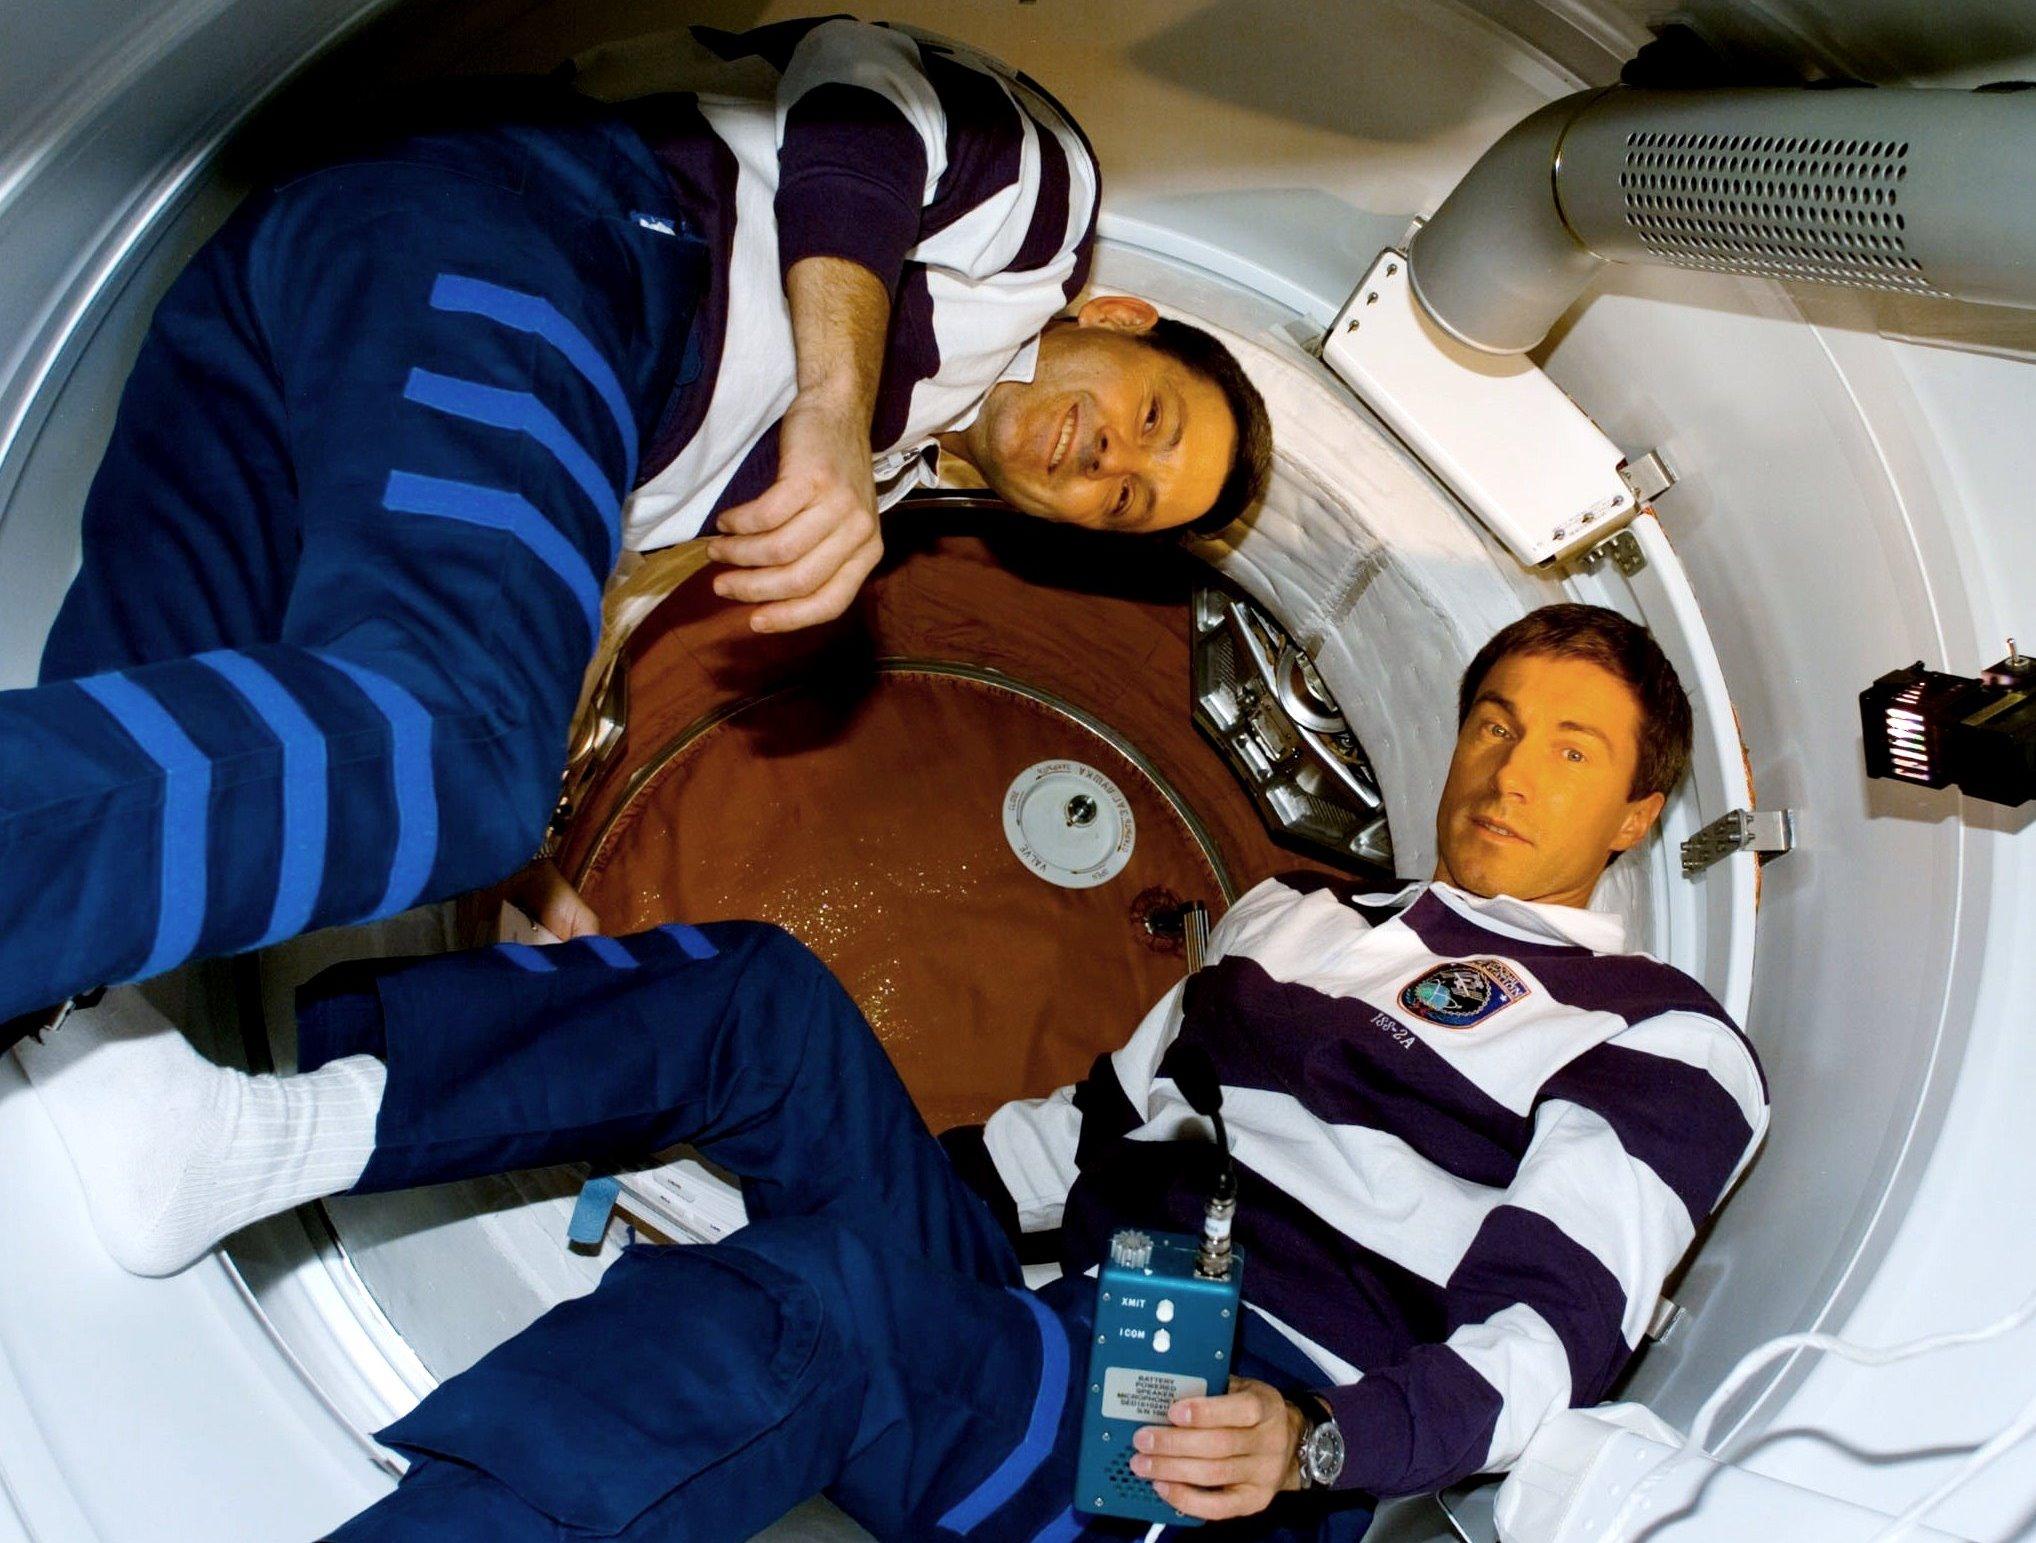 NASA astronaut Bob Cabana, left and Russian cosmonaut Sergei Krikalev prepare to open the hatch to the Zarya module during STS-88. Credit: NASA